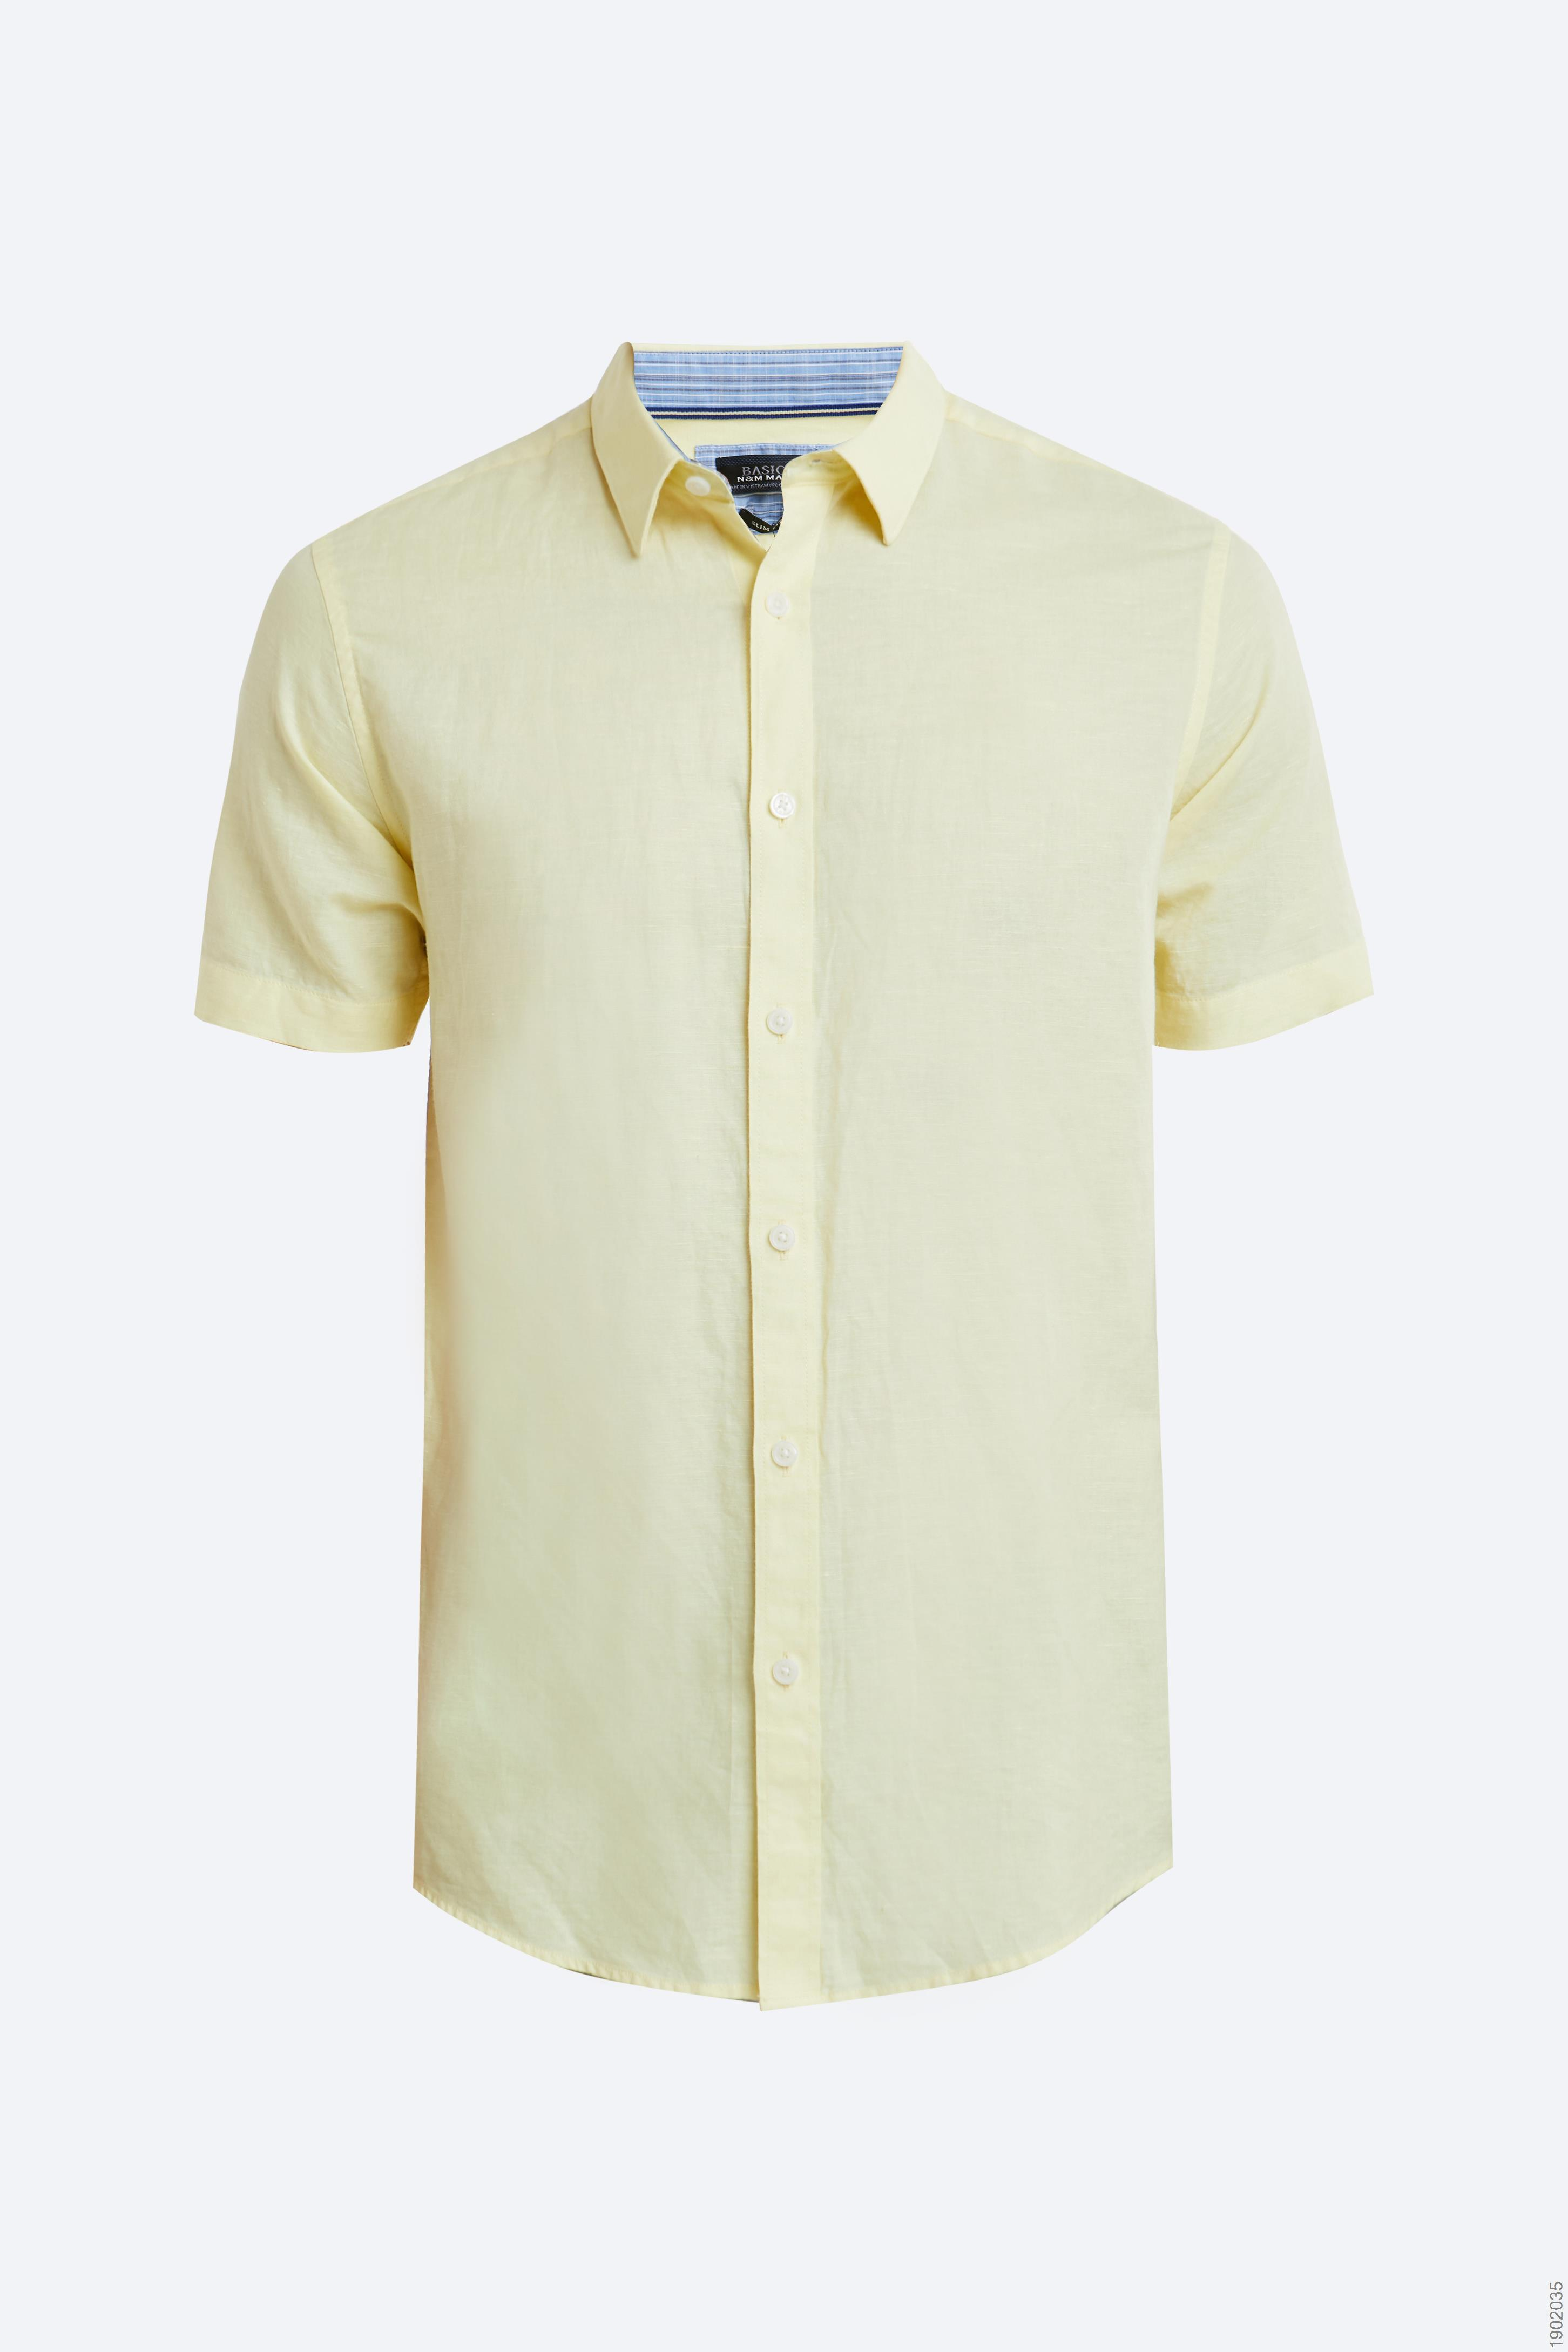 áo sơmi nam tay ngắn - 1902035